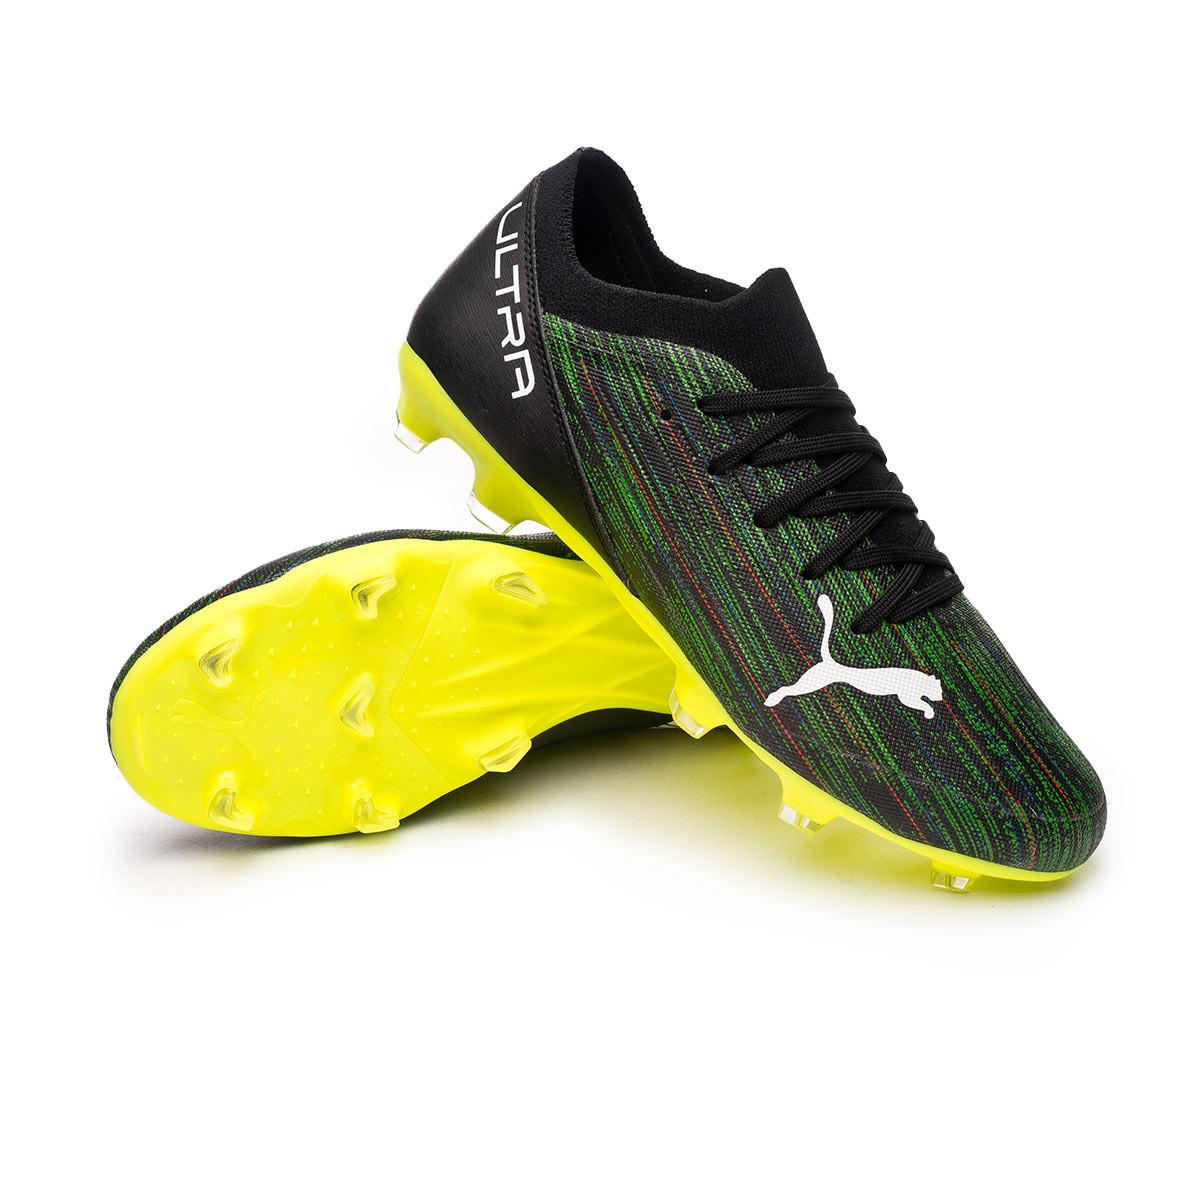 Puma Ultra 3.2 FG/AG Football Boots